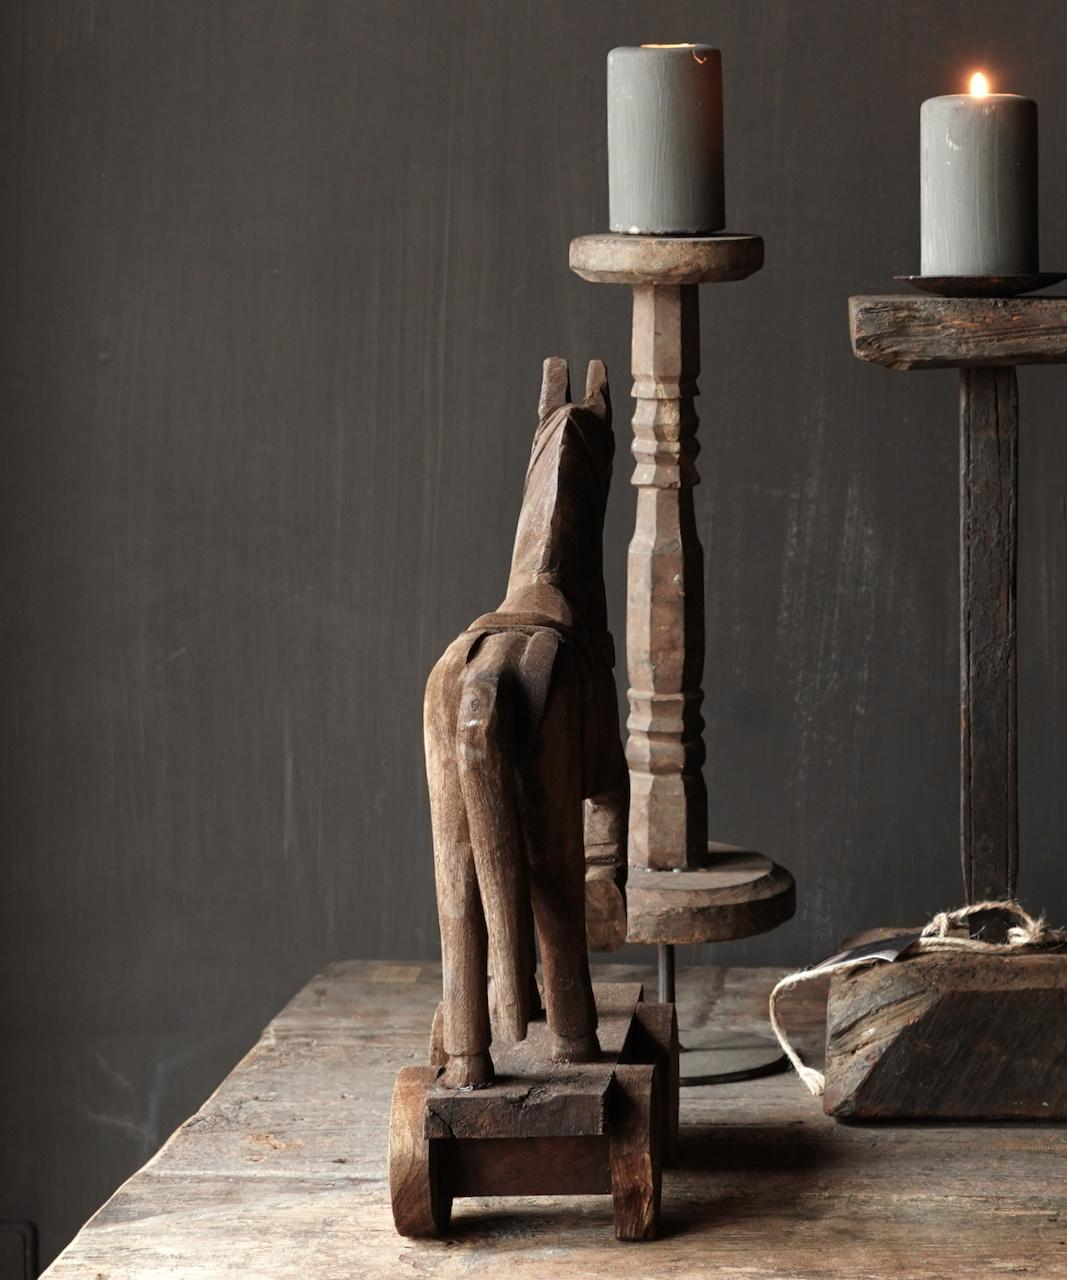 Holzpferd handgefertigt aus altem Holz-4